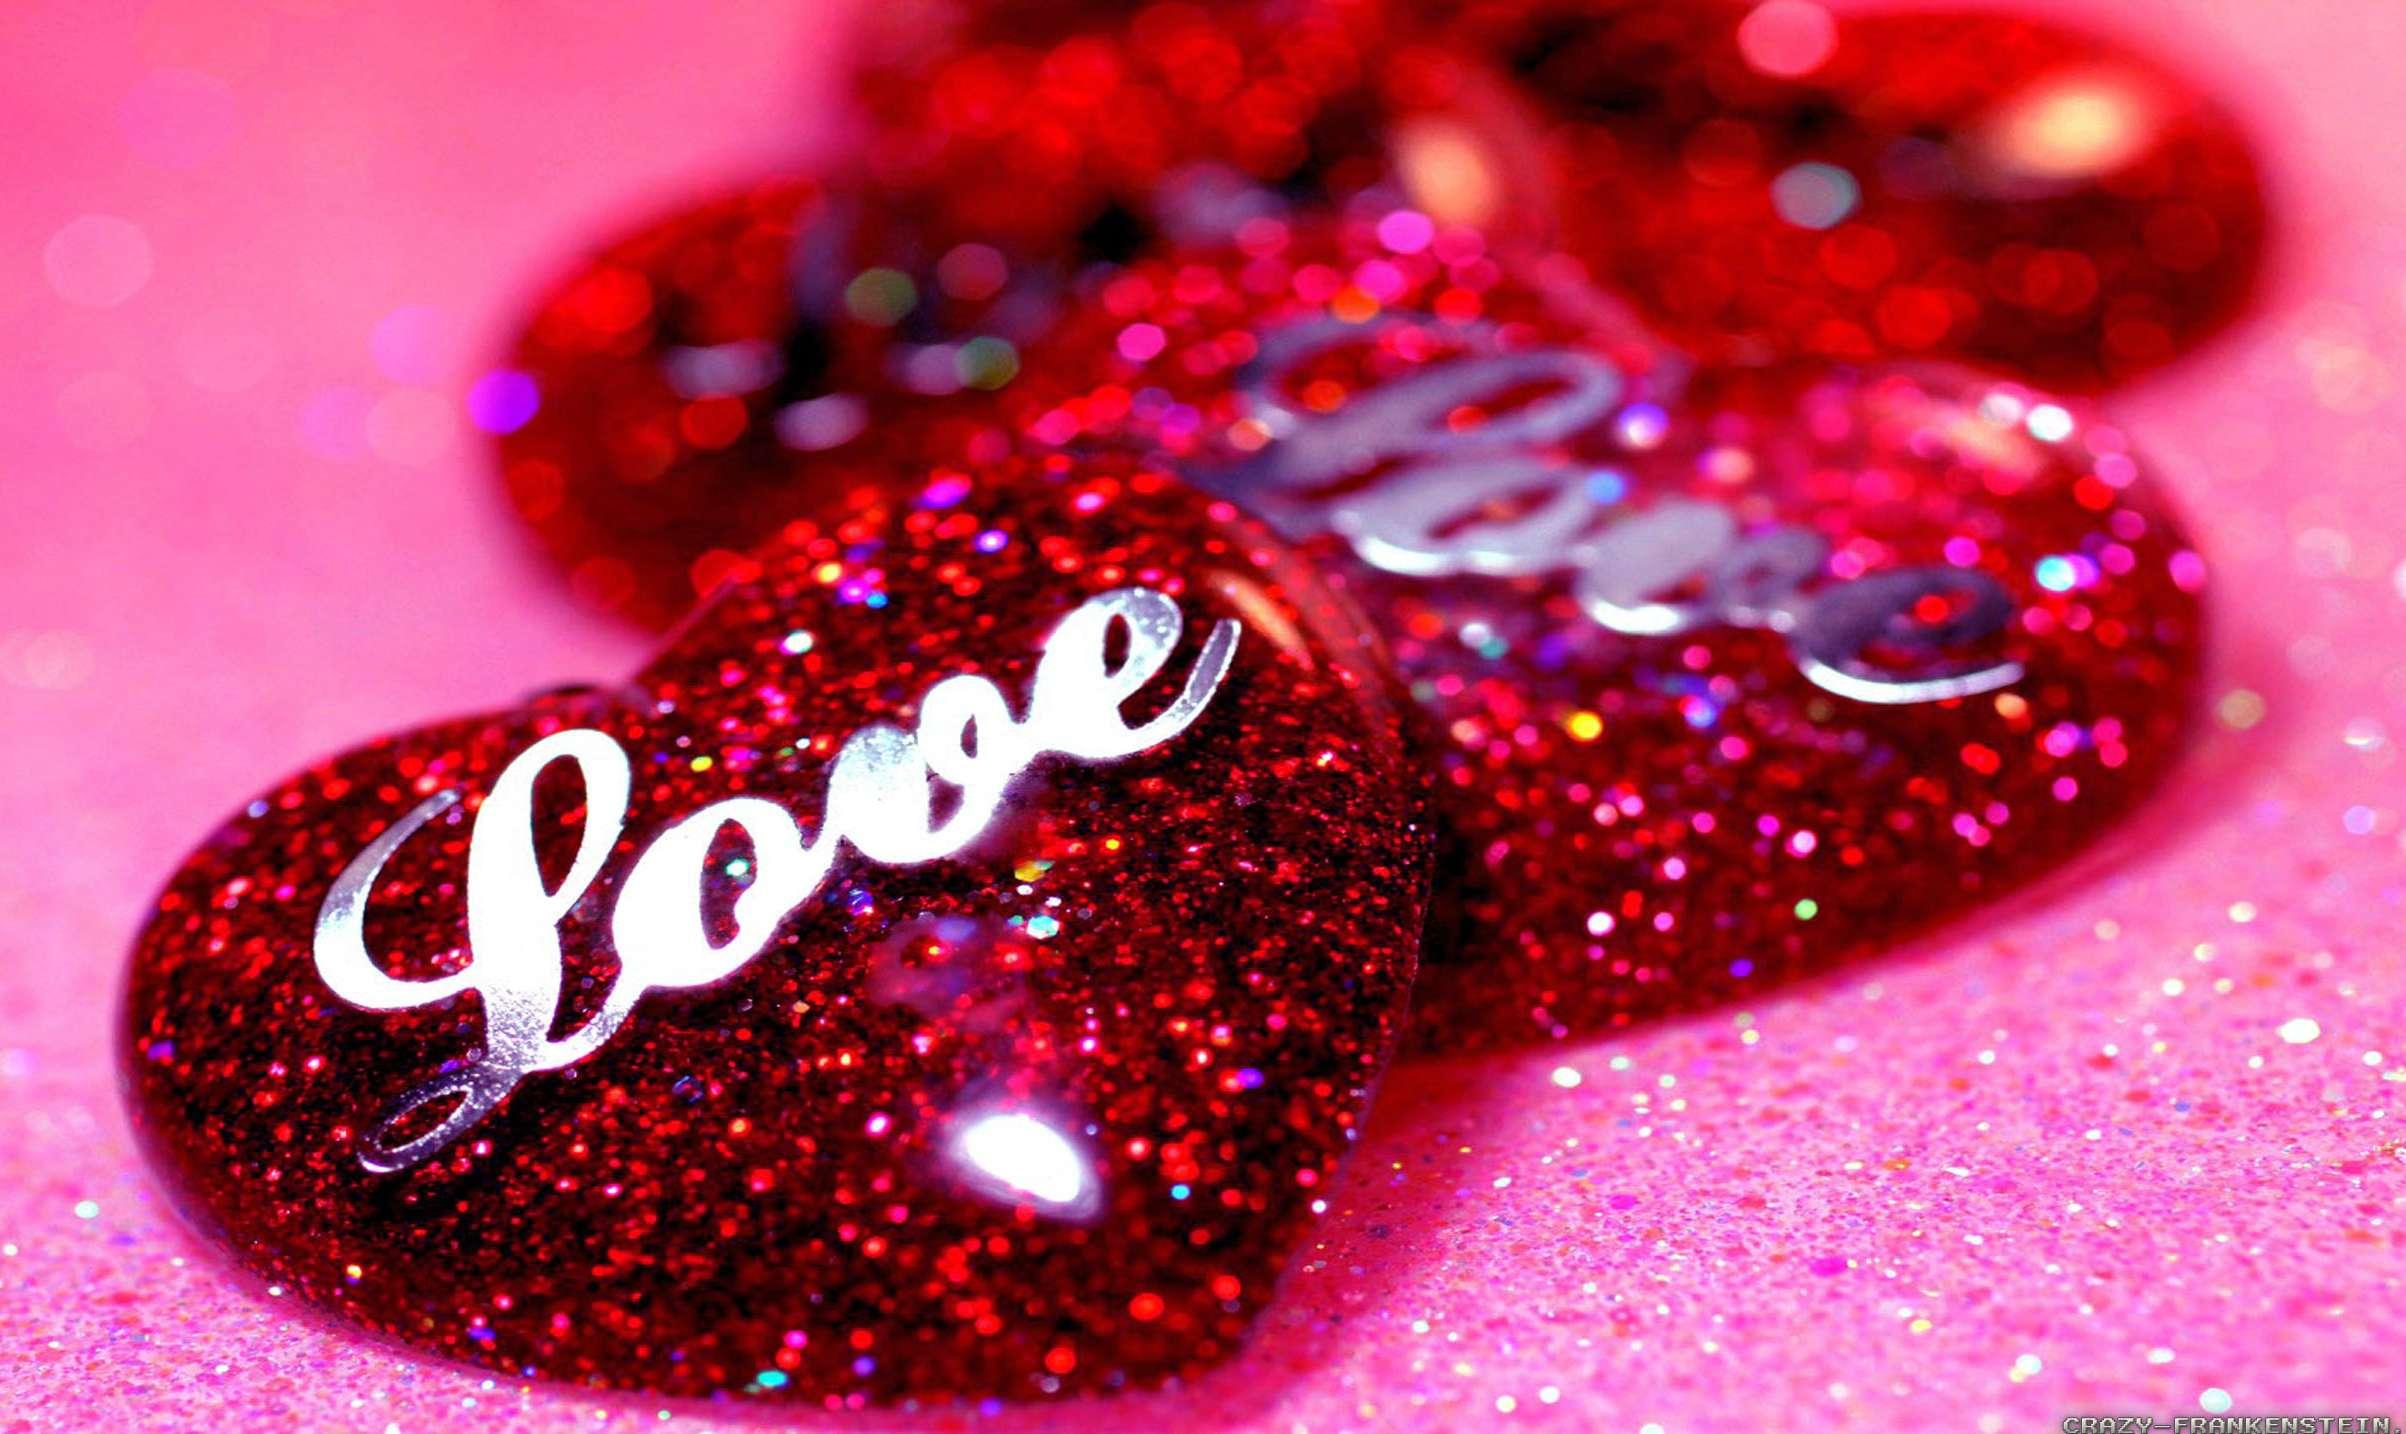 Cute Love Wallpaper Full Hd Download Desktop Mobile - Free Download Cute Love Wallpapers For Mobile - HD Wallpaper